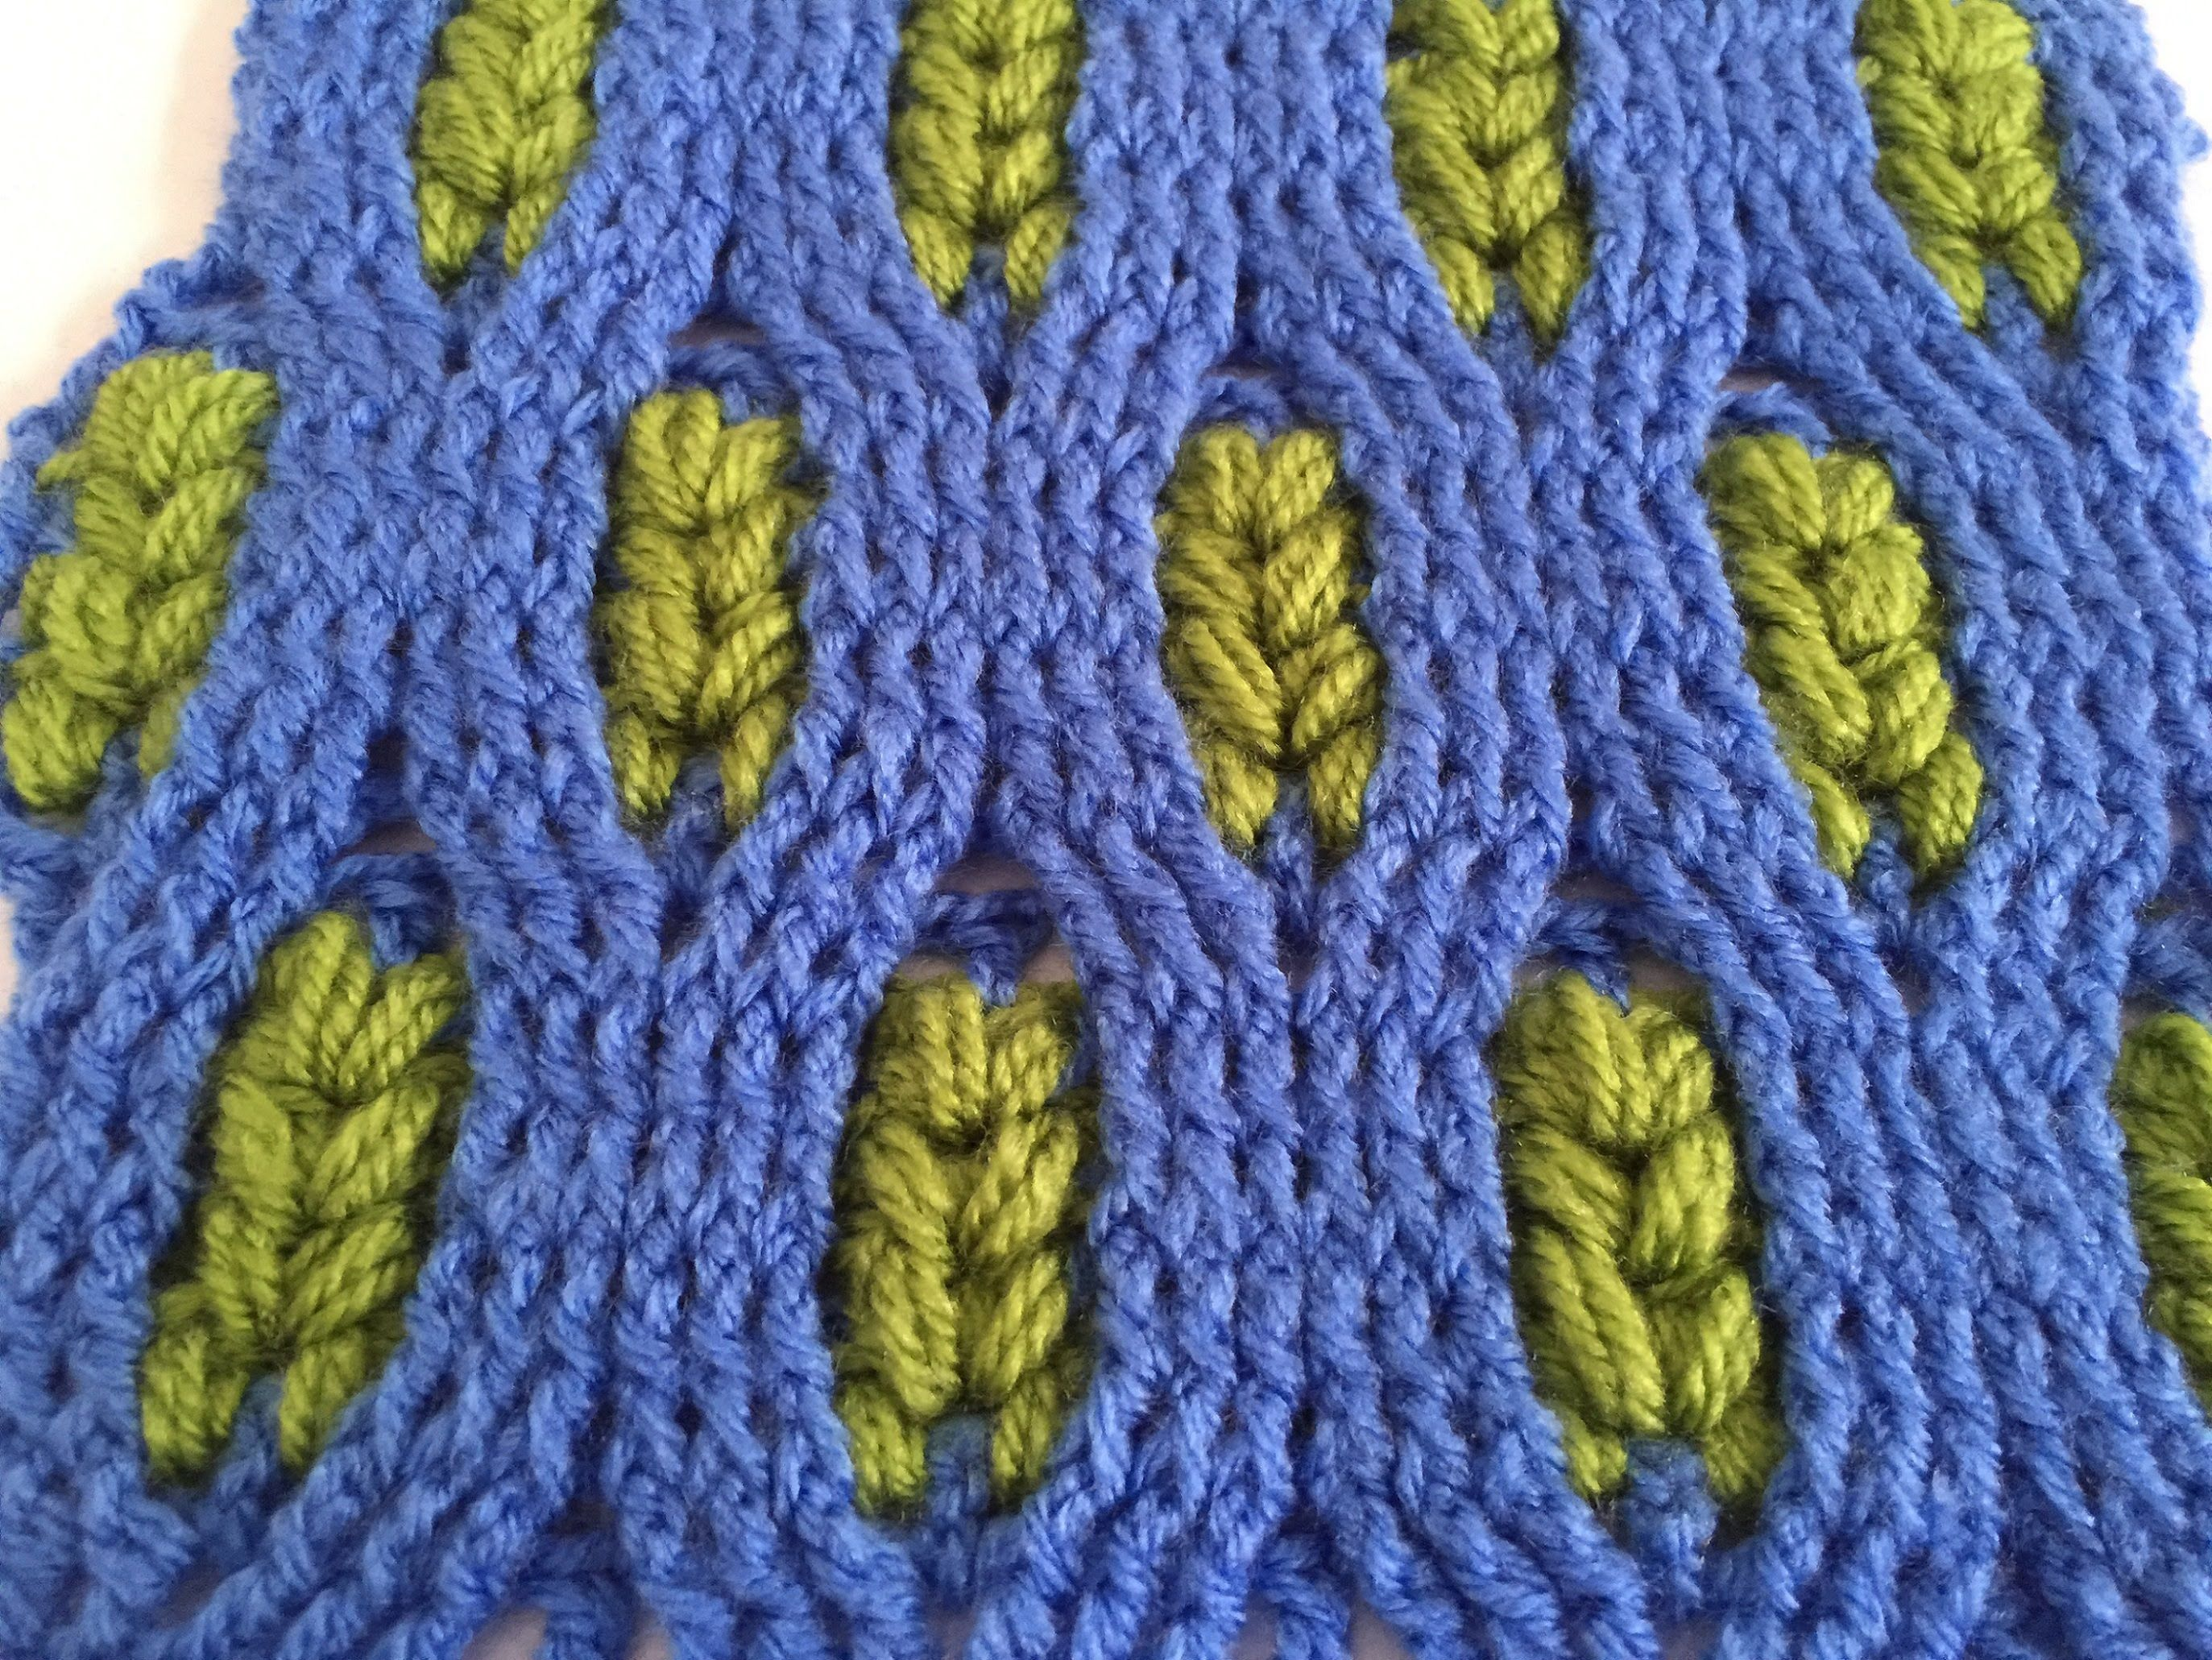 Crochet pattern - Wheat Crochet Stitch - Cable pattern   crochet ...